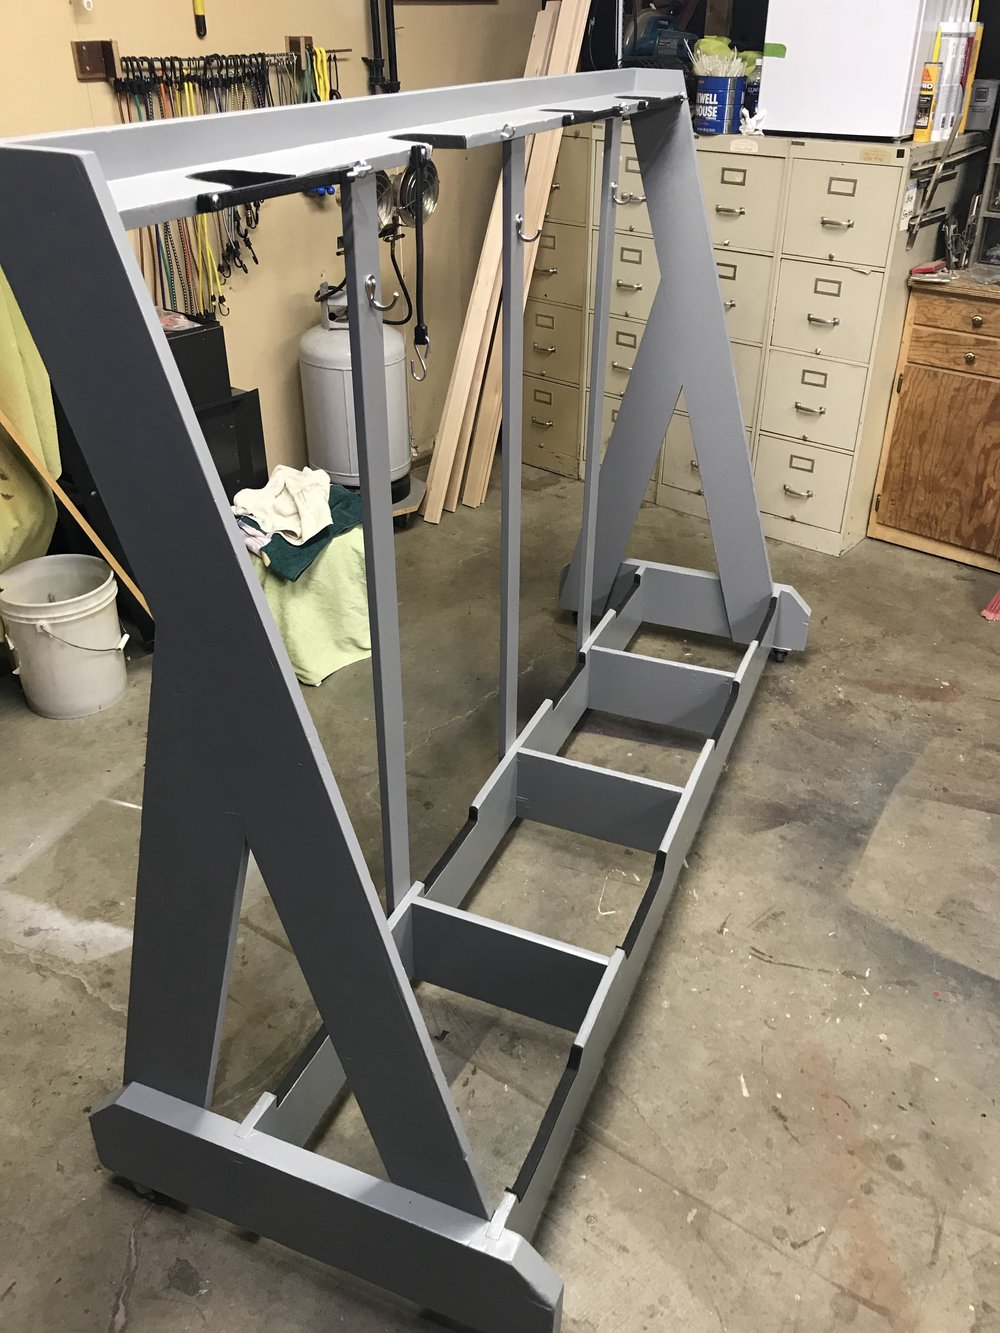 Beautifully refurbished instrument rack looks brand new!